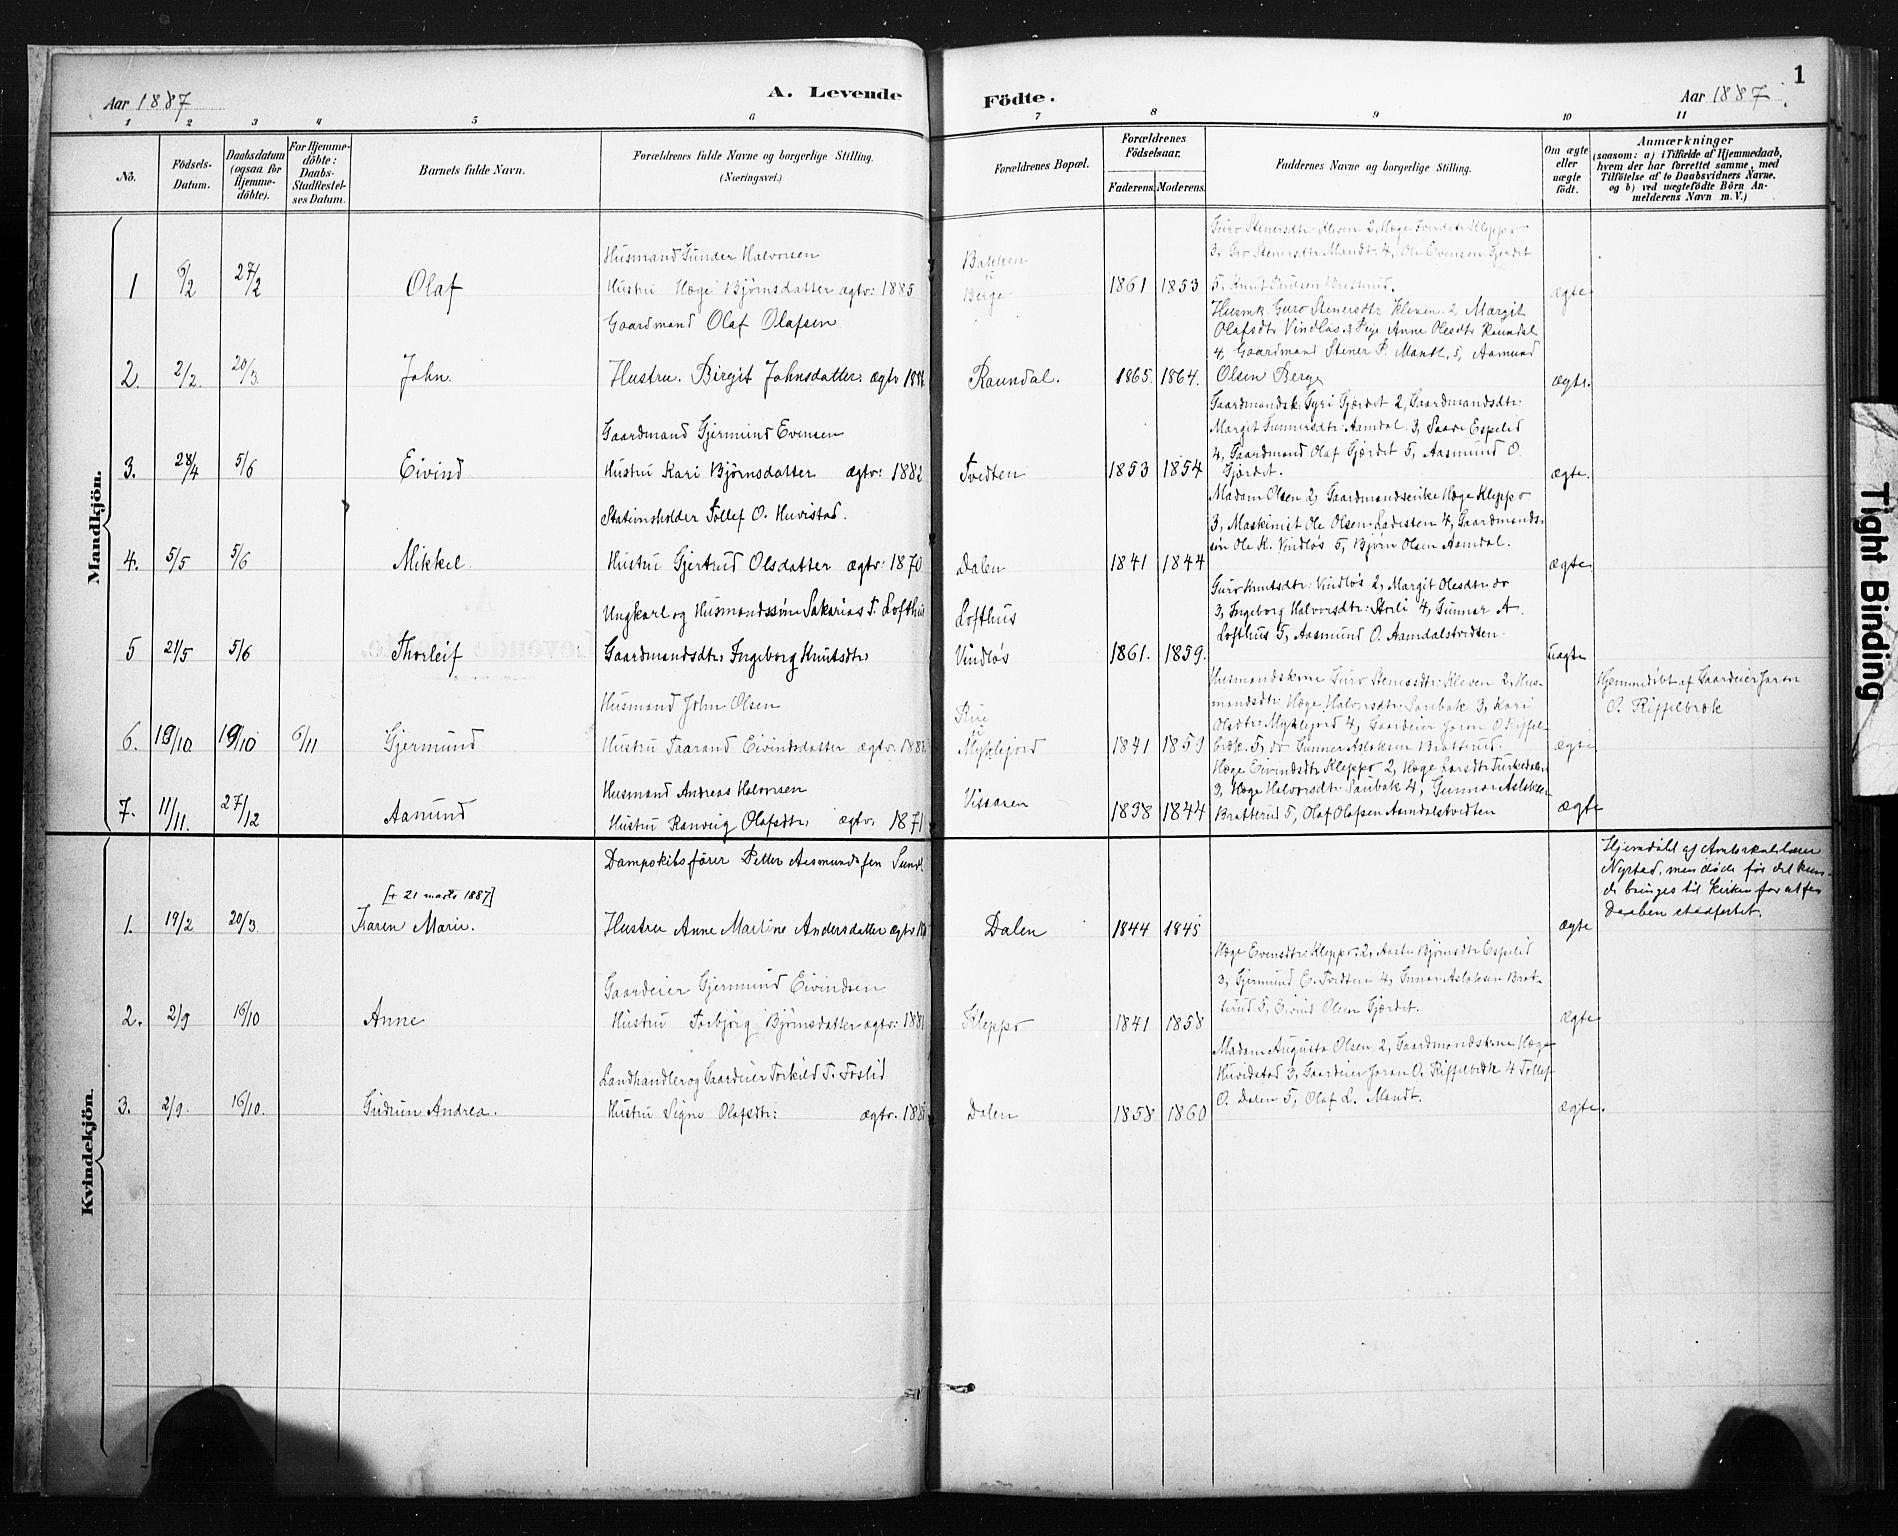 SAKO, Lårdal kirkebøker, F/Fb/L0002: Ministerialbok nr. II 2, 1887-1918, s. 1